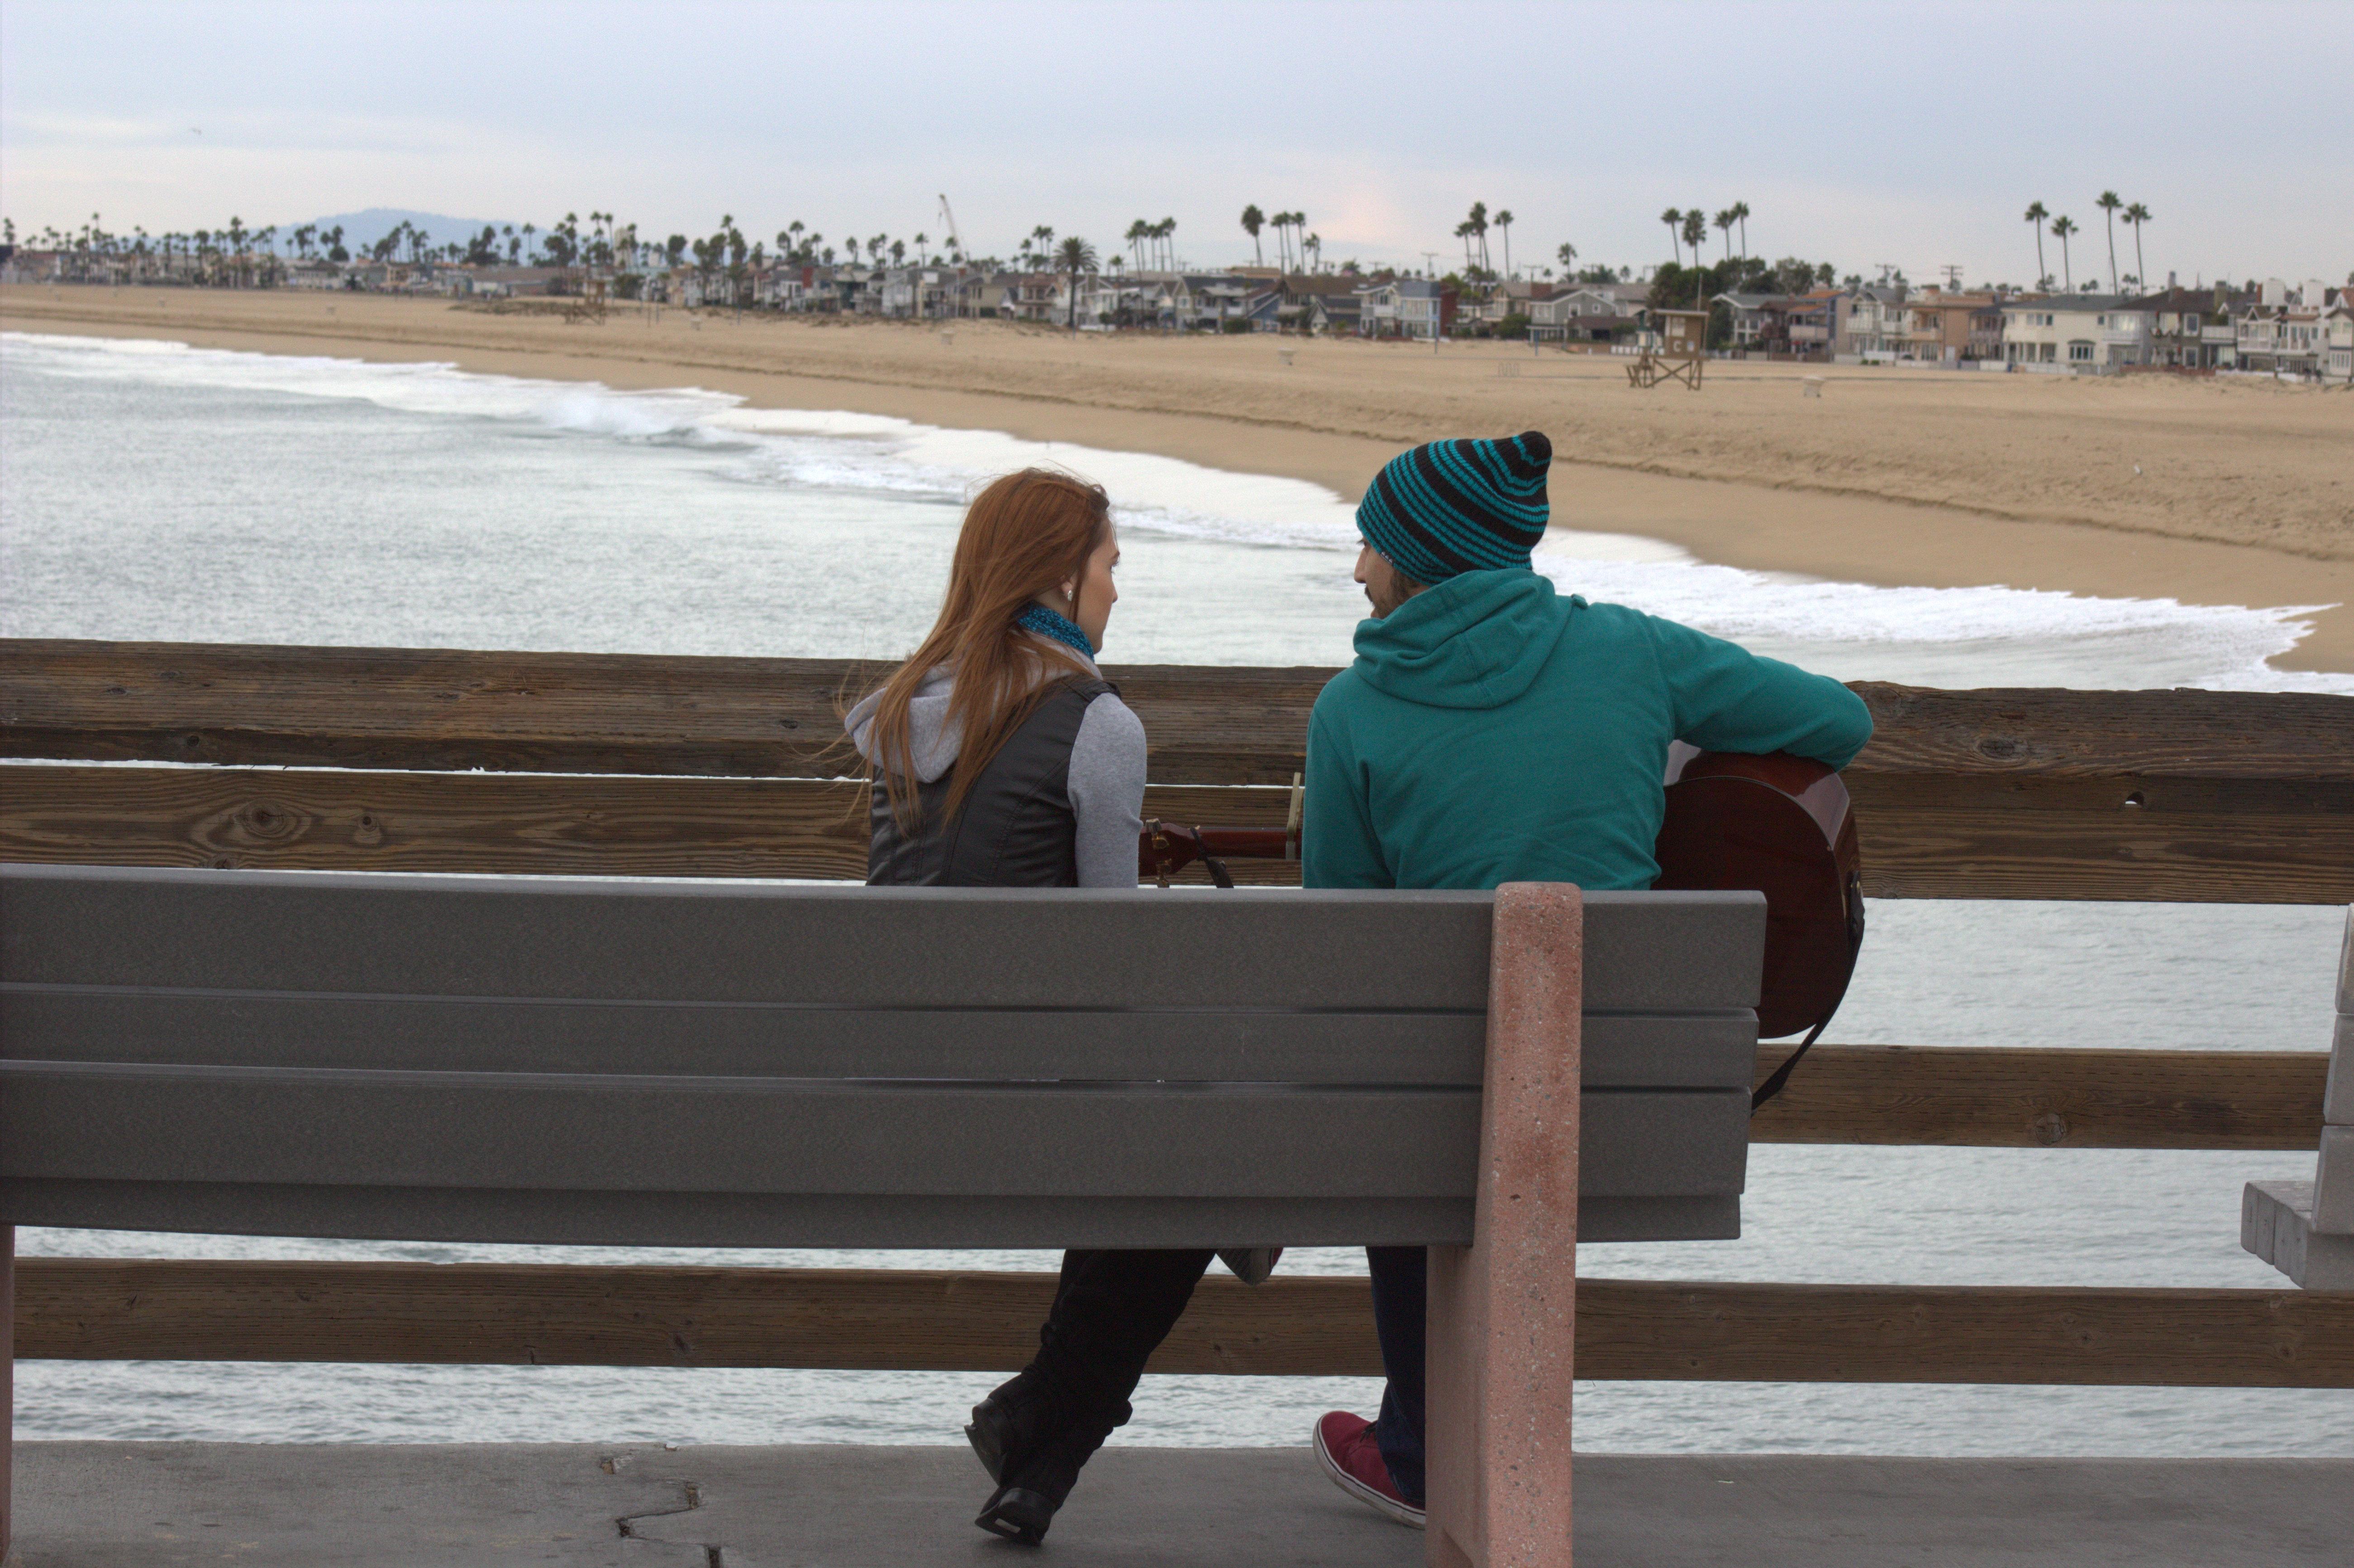 Engagement Proposal Ideas in Balboa Beach, CA